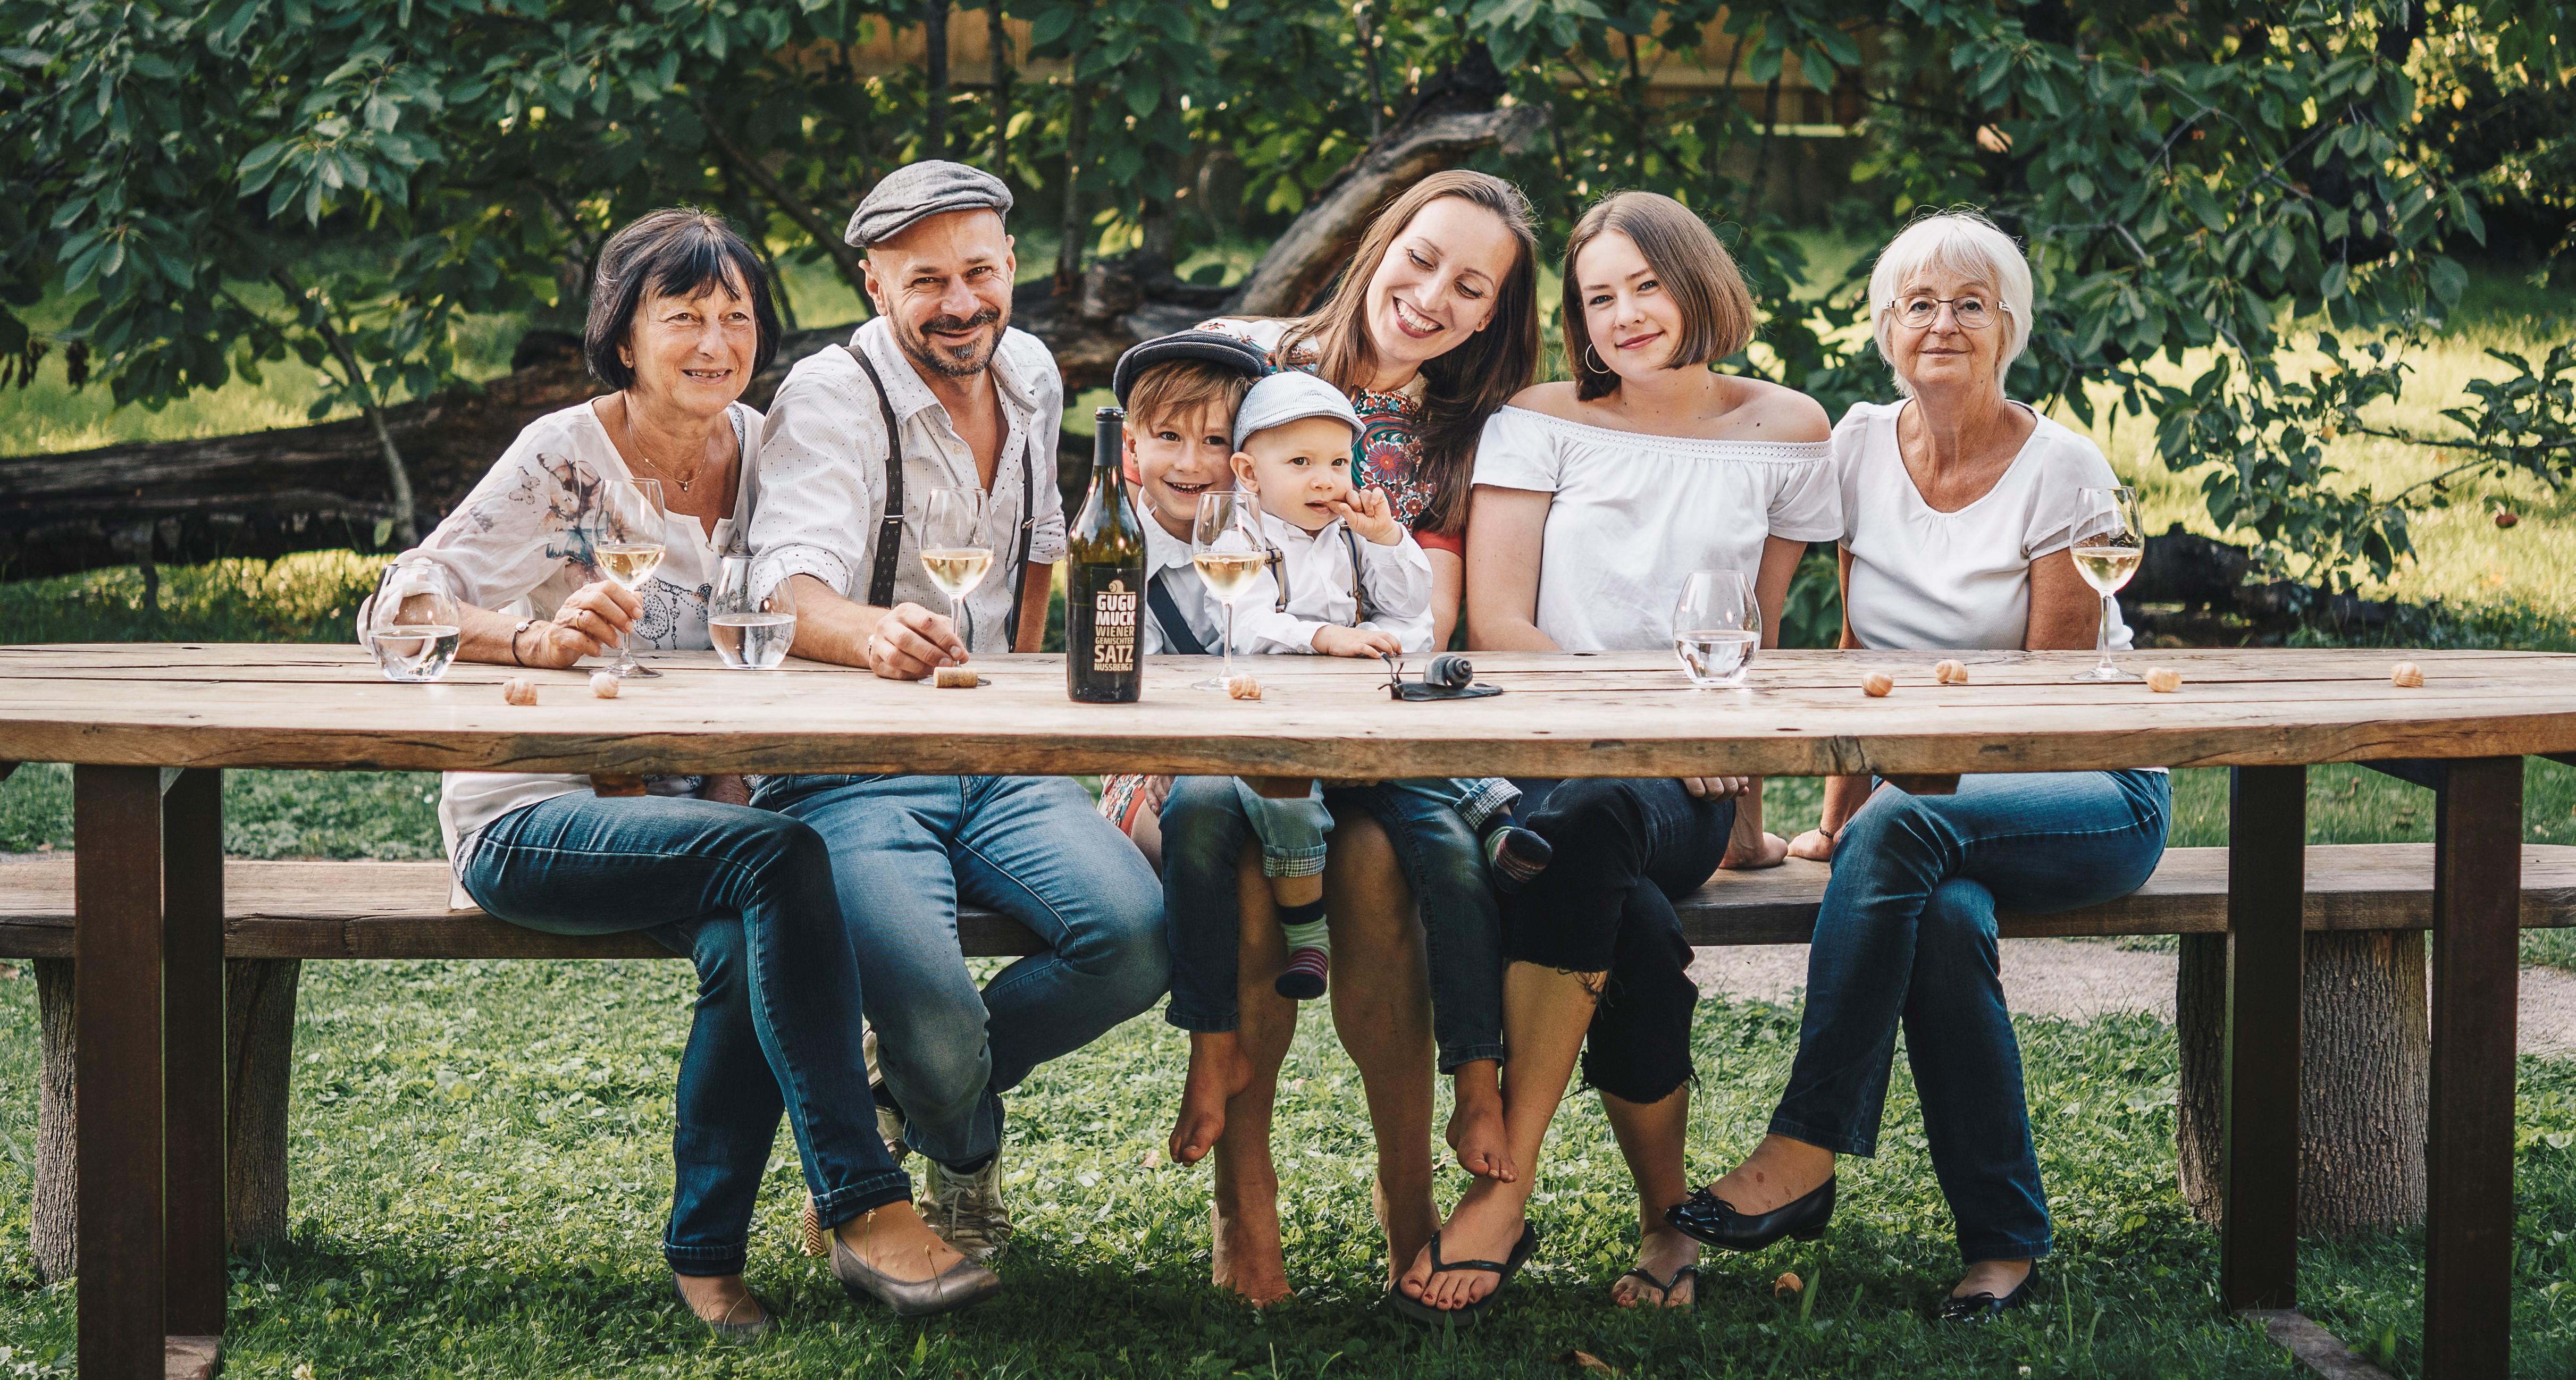 Mehrgenerationen-Familie Gugumuck, Andreas, Sebastian, Maria, Lena, Tante Elisabeth, Mutter Helga